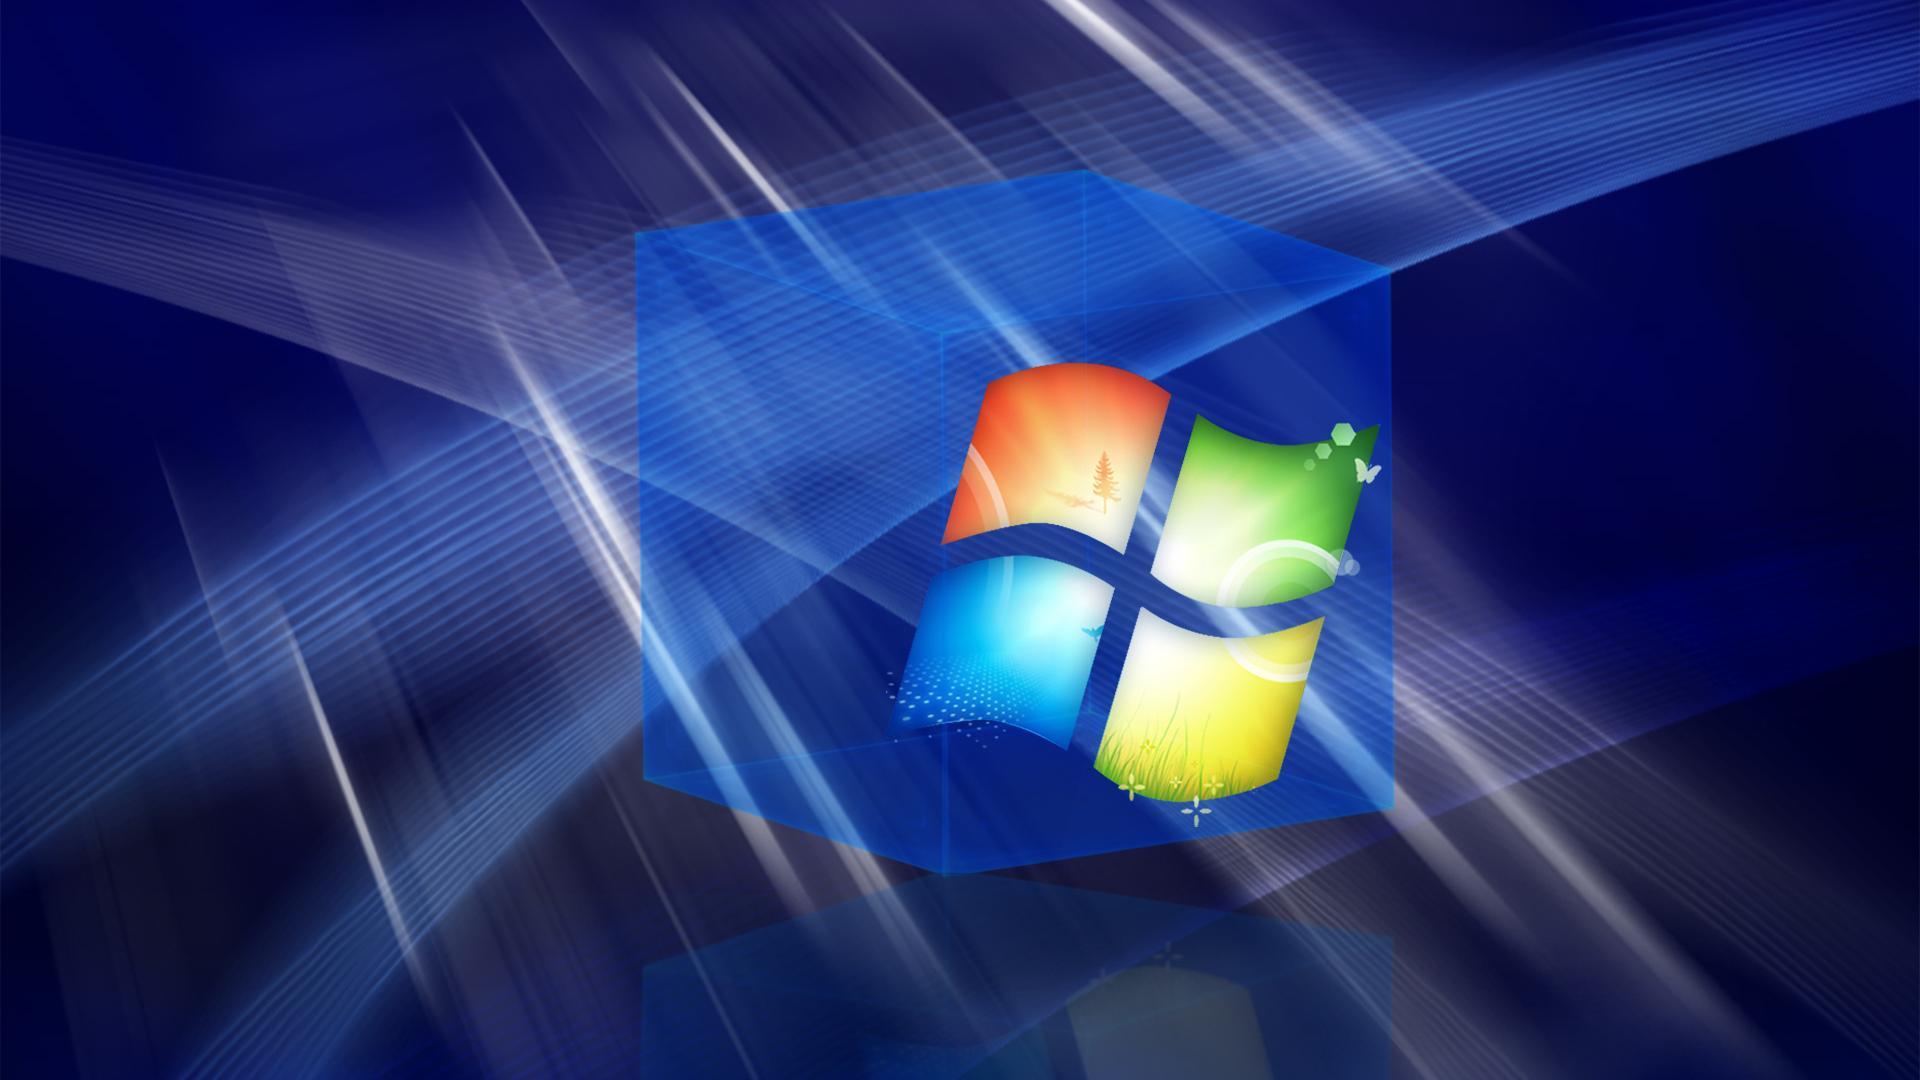 hd 3d wallpapers 1080p widescreen windows 7 1   HD Beautiful Desktop 1920x1080